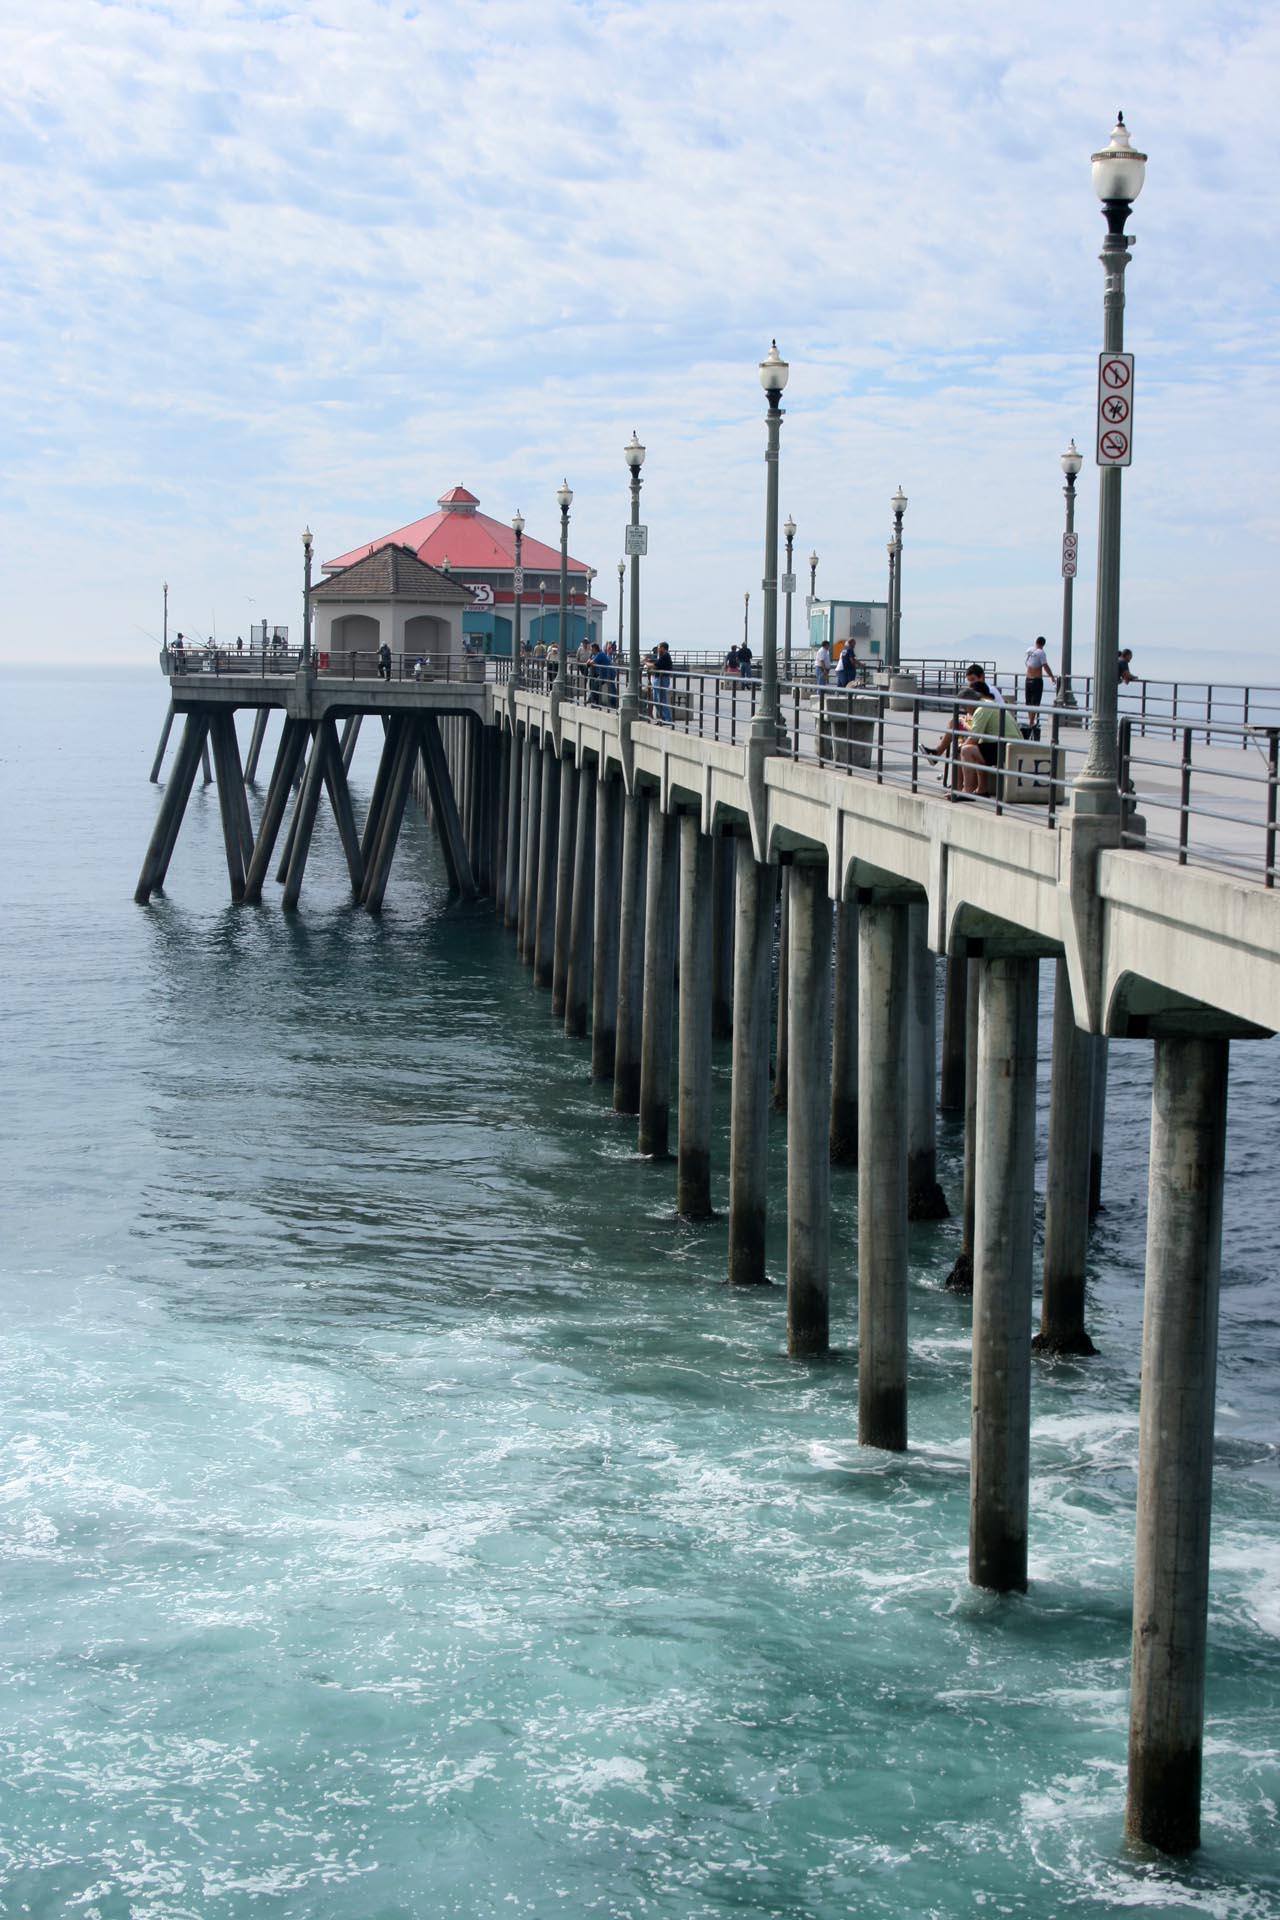 Beach Pier Drawing The Pier at Huntington Beach